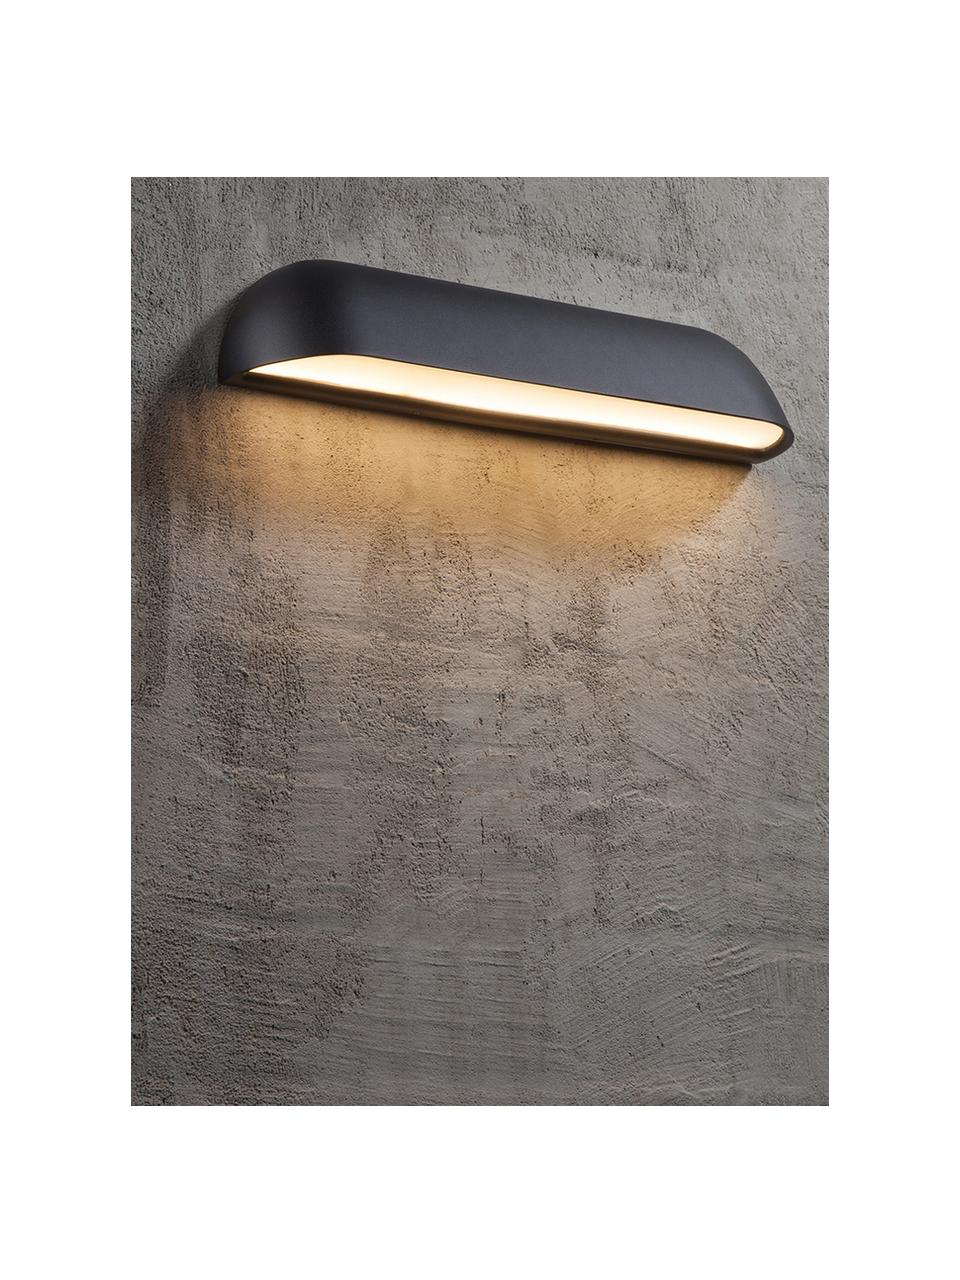 Design LED-Wandleuchte Front, Lampenschirm: Stahl, lackiert, Schwarz Diffusor: Weiß, milchig-transparent, 36 x 7 cm